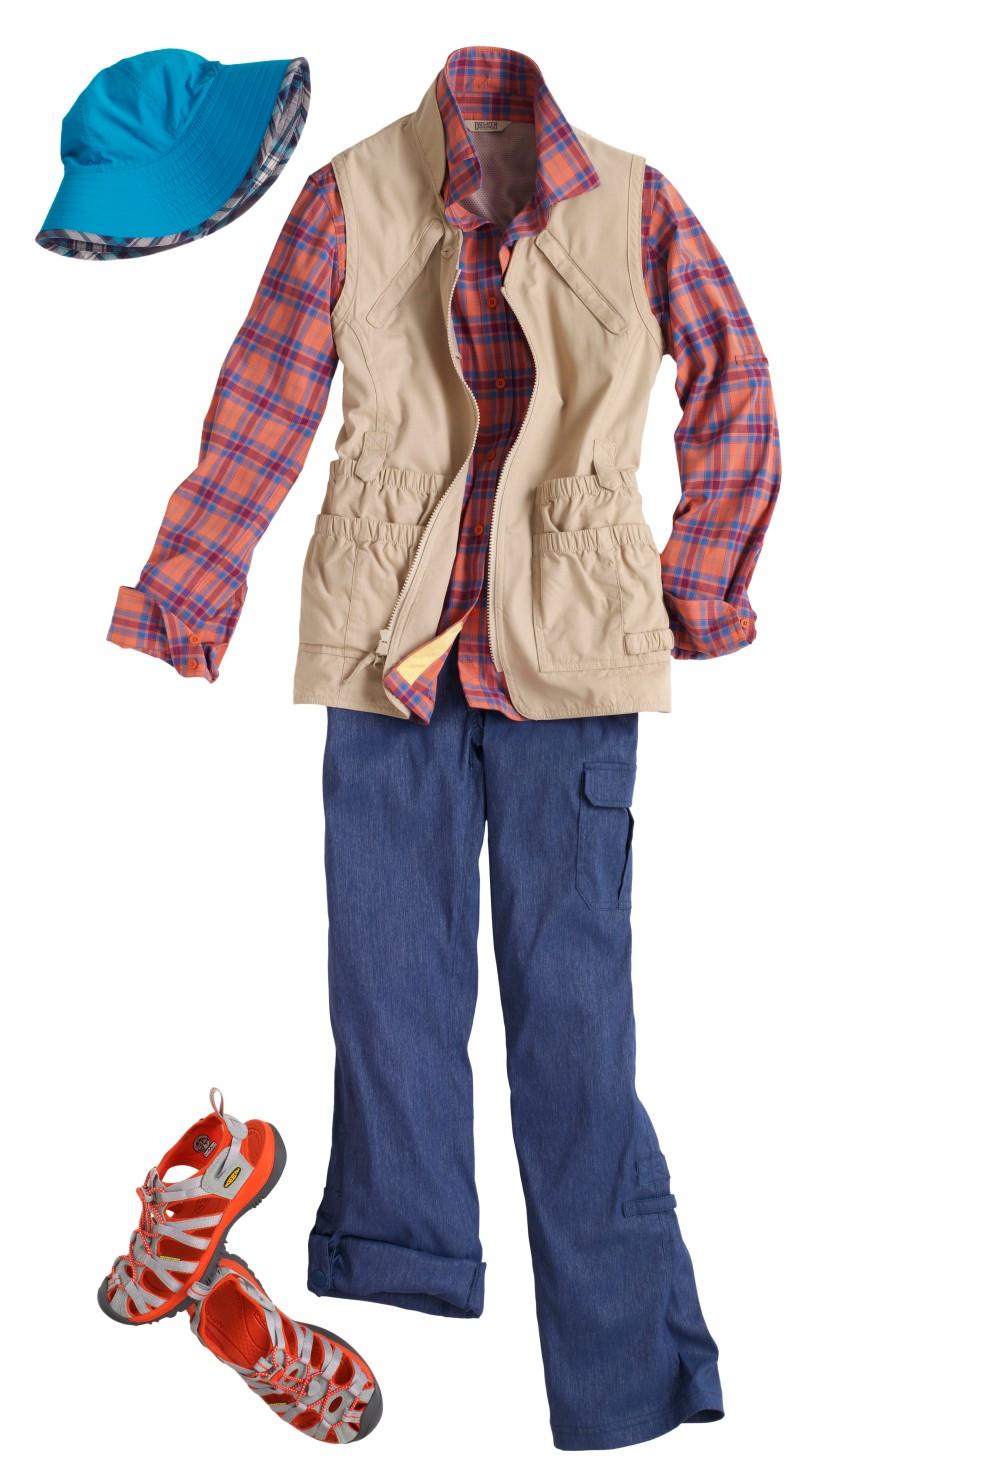 Garden Clothes: DuluthFlex Sidewinder Shirt - Garden Vest - DuluthFlex Dry on the Fly Convertible Pants